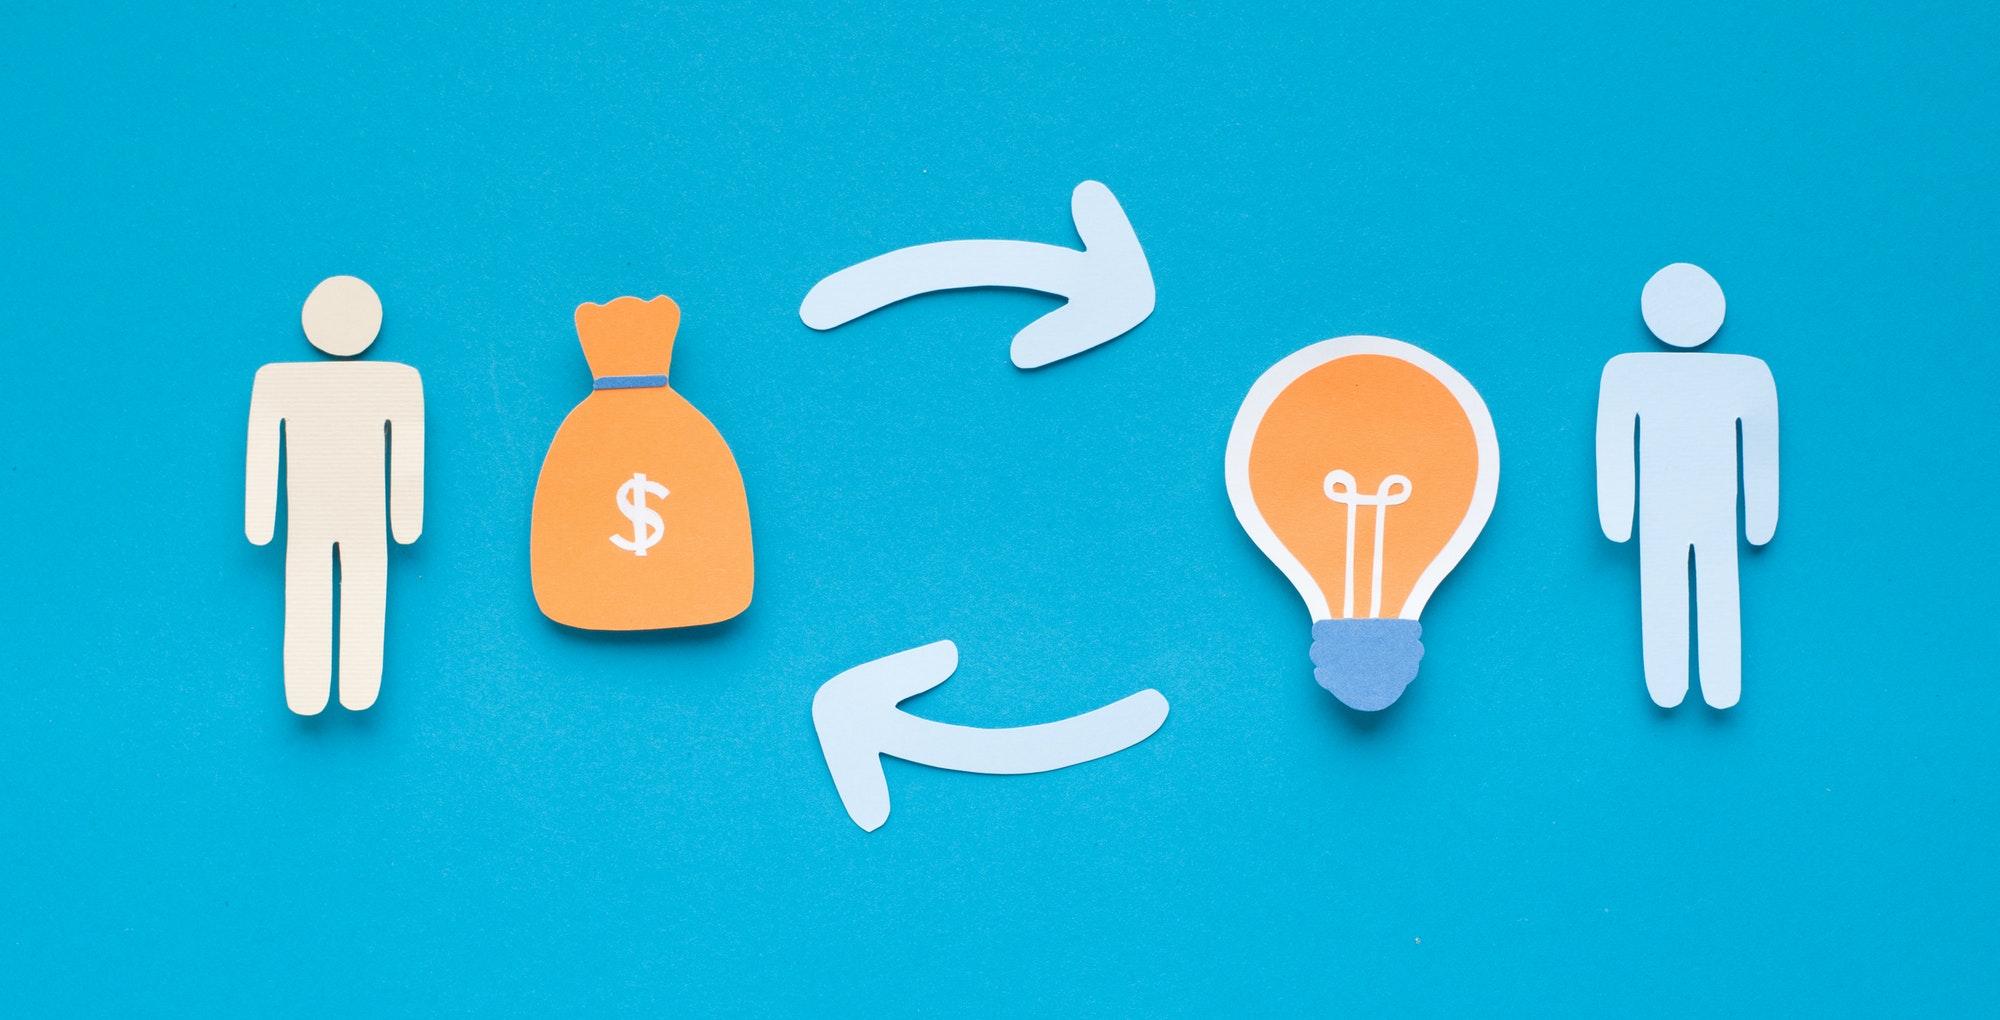 Enterpreneur exchanging his idea for investors money